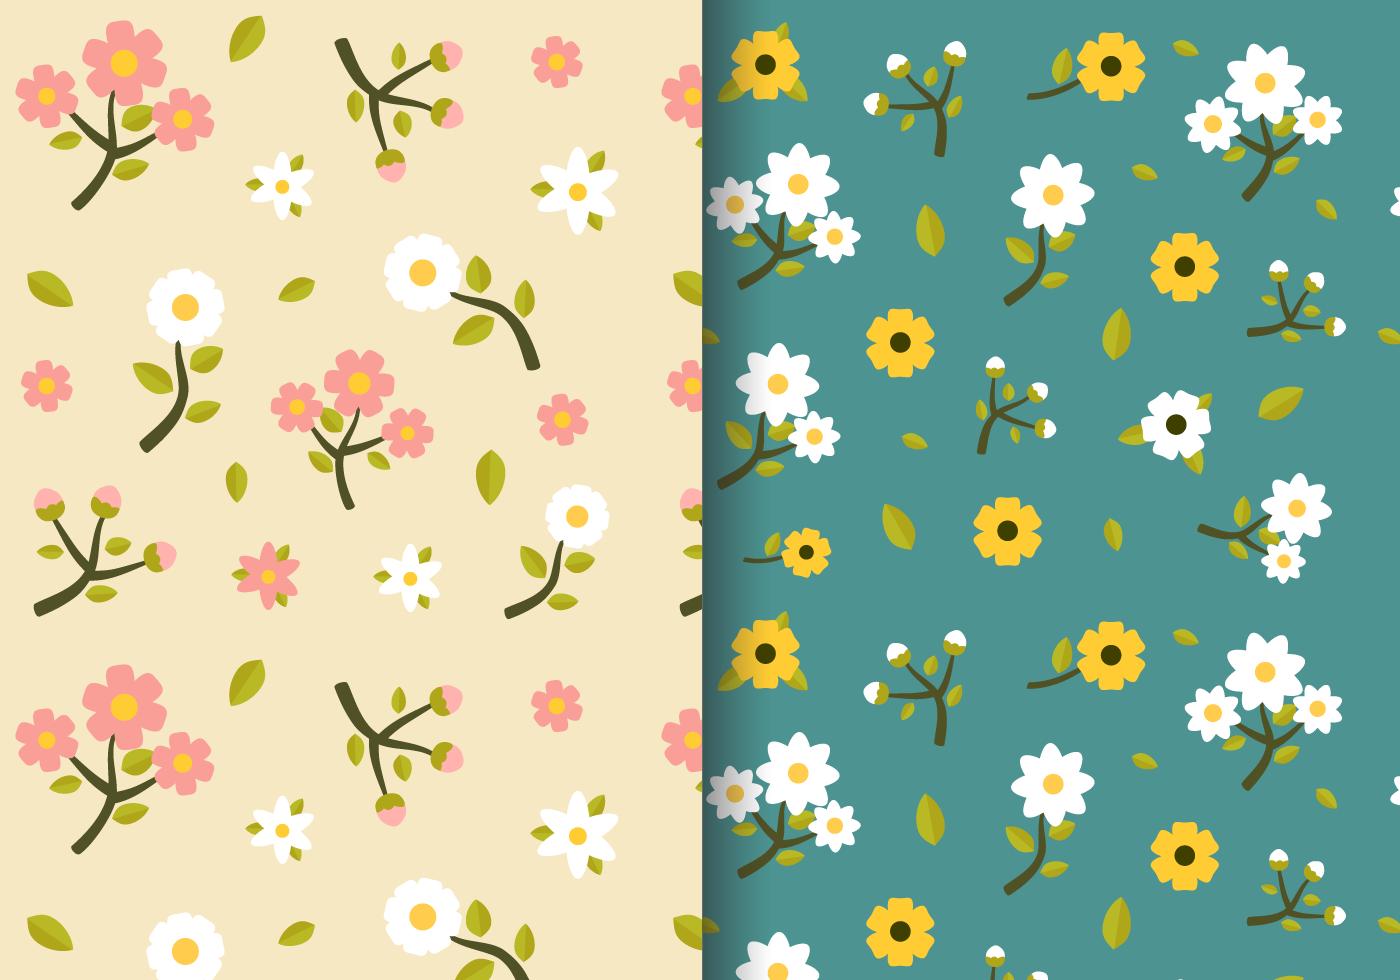 Free Vintage Spring Floral Pattern Download Free Vectors